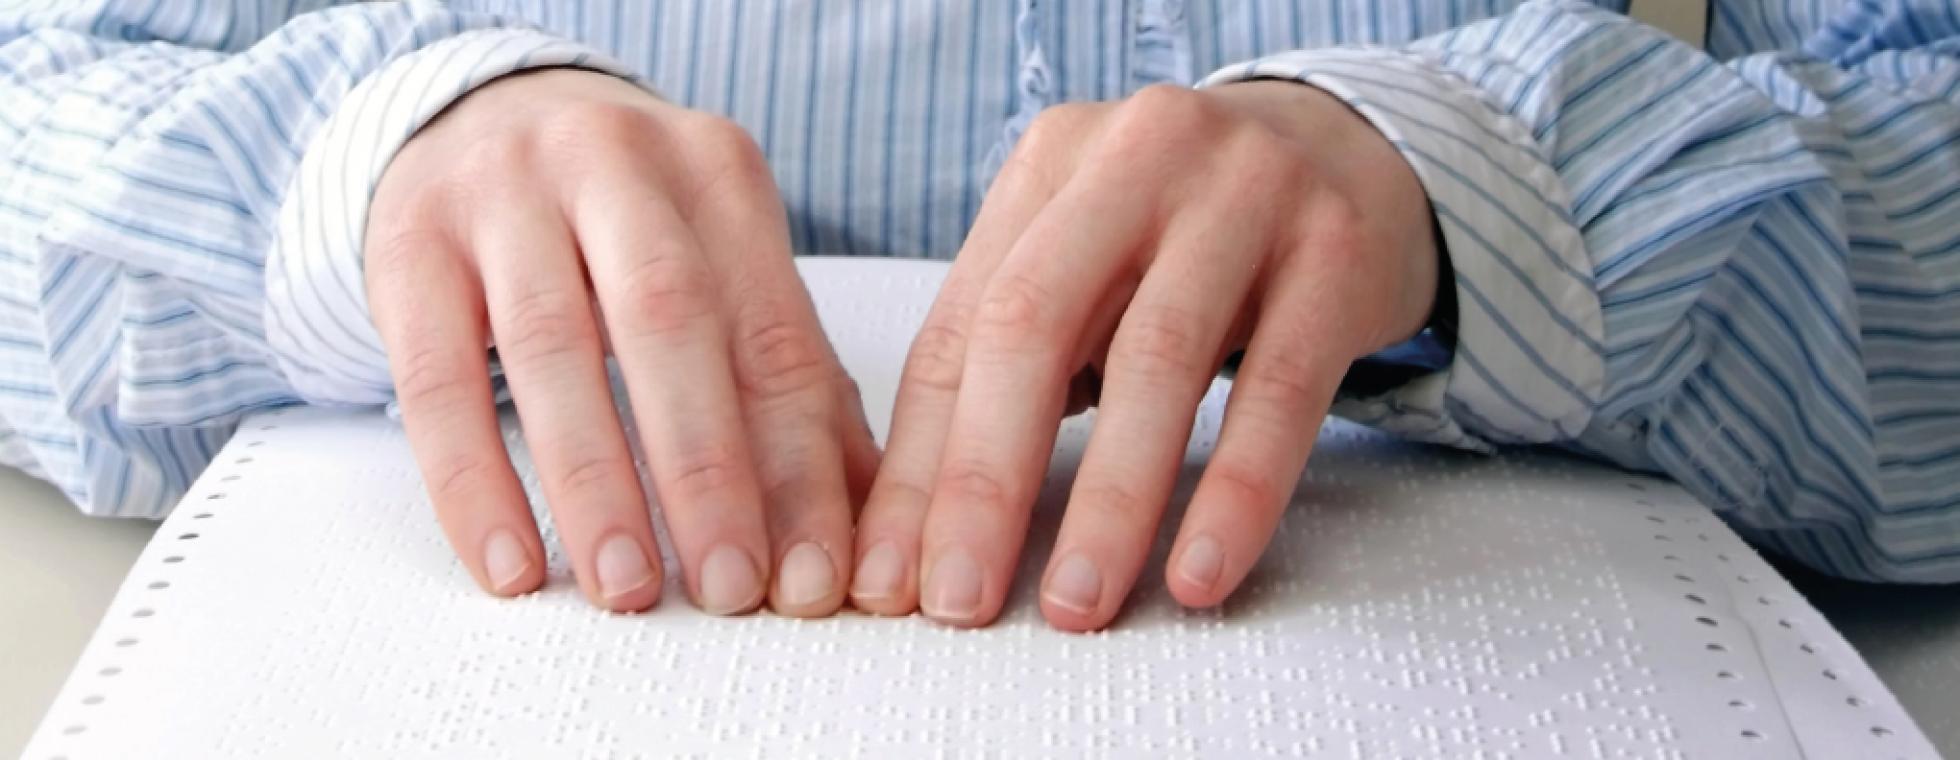 Hände lesen Brailleschrift